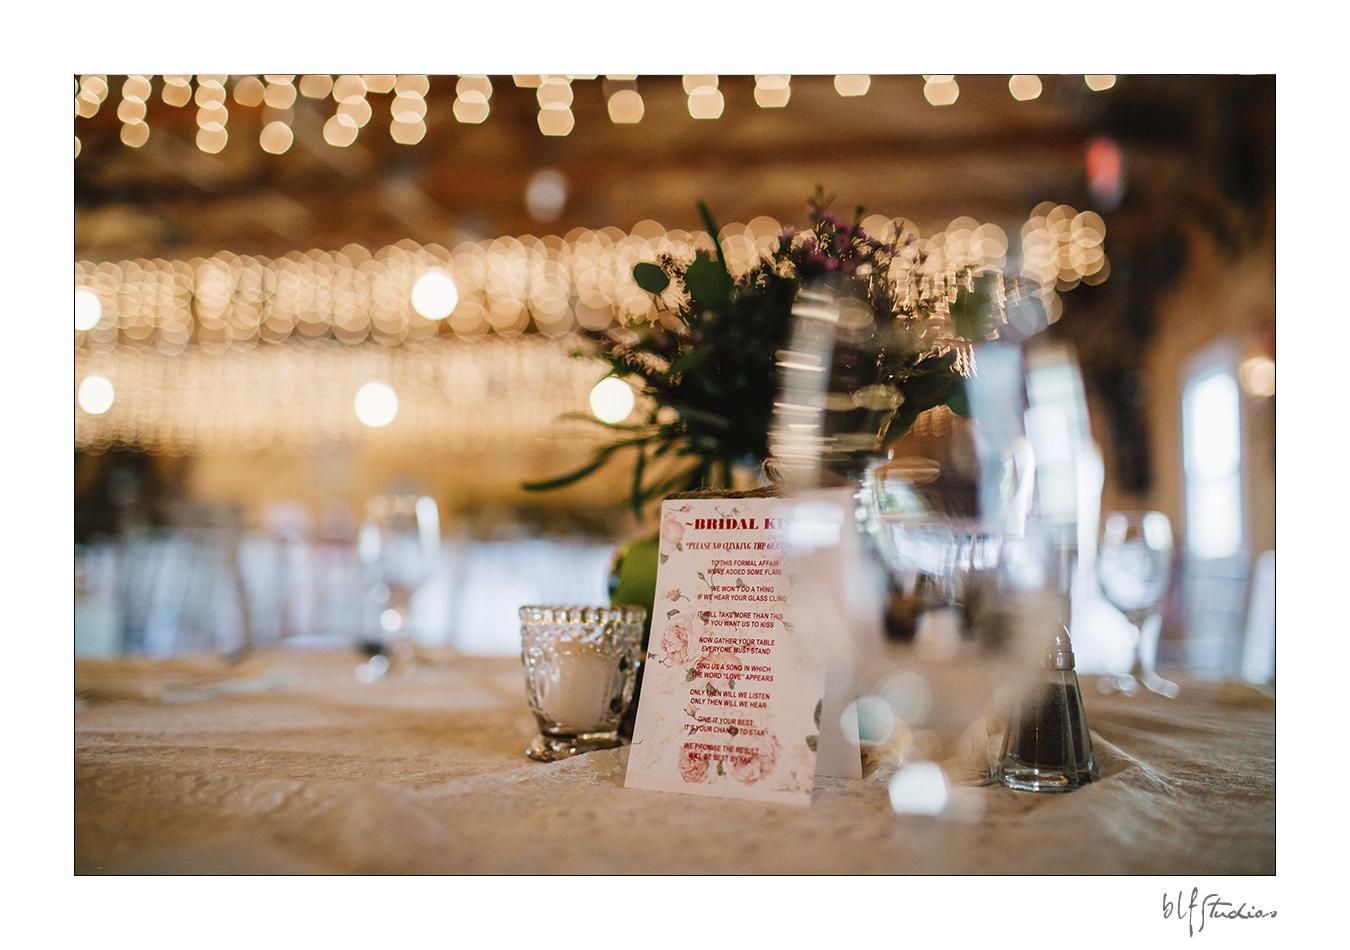 004-winnipeg-hitchnpost-wedding-marla-alana.jpg